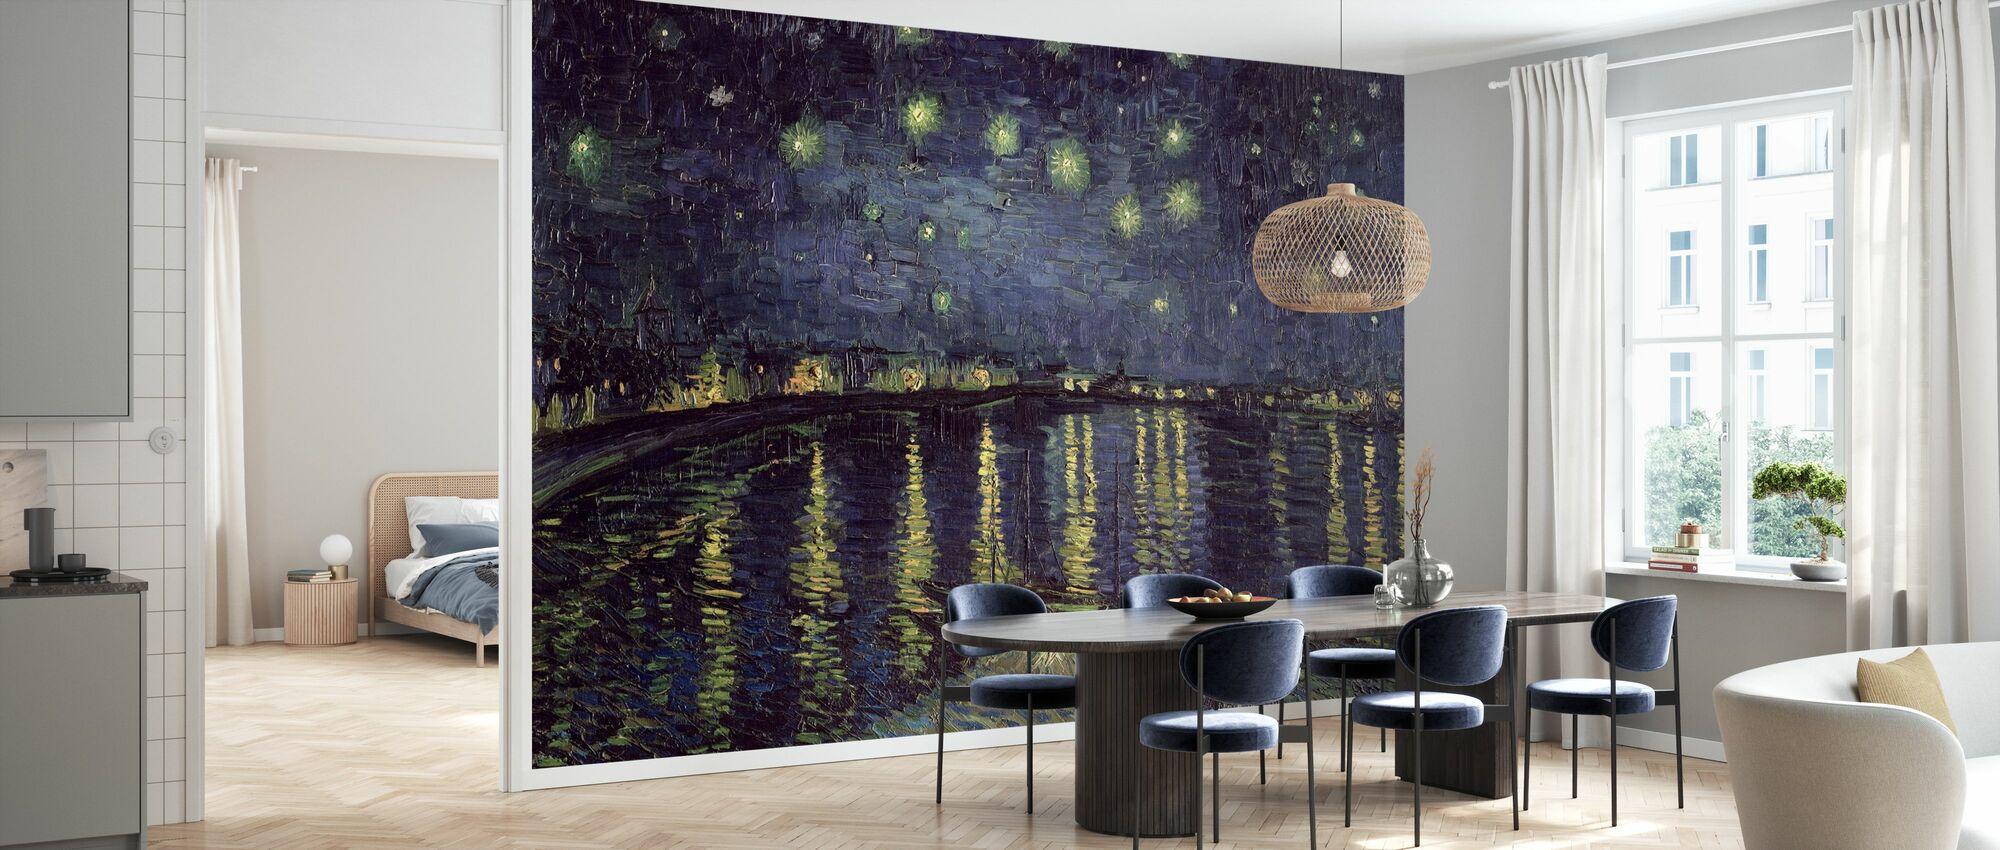 Starry Night - Vincent van Gogh - Tapet - Kök